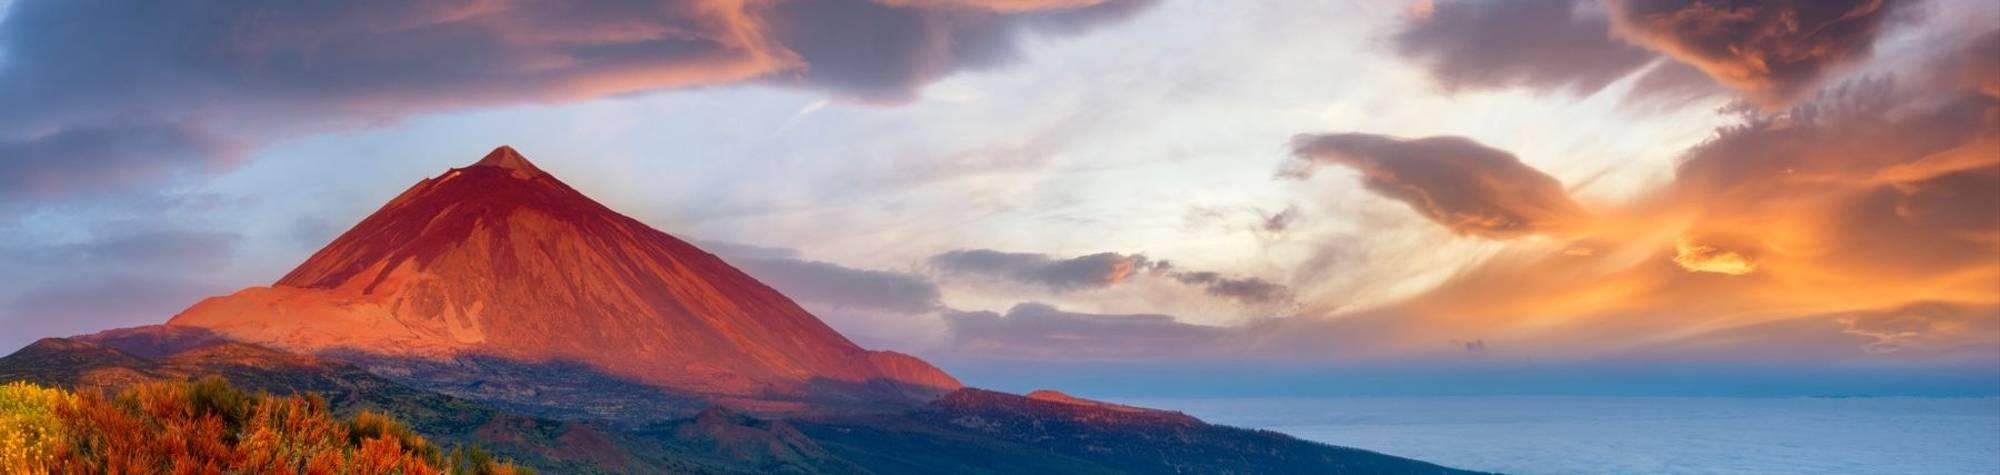 Tenerife Mount Teide